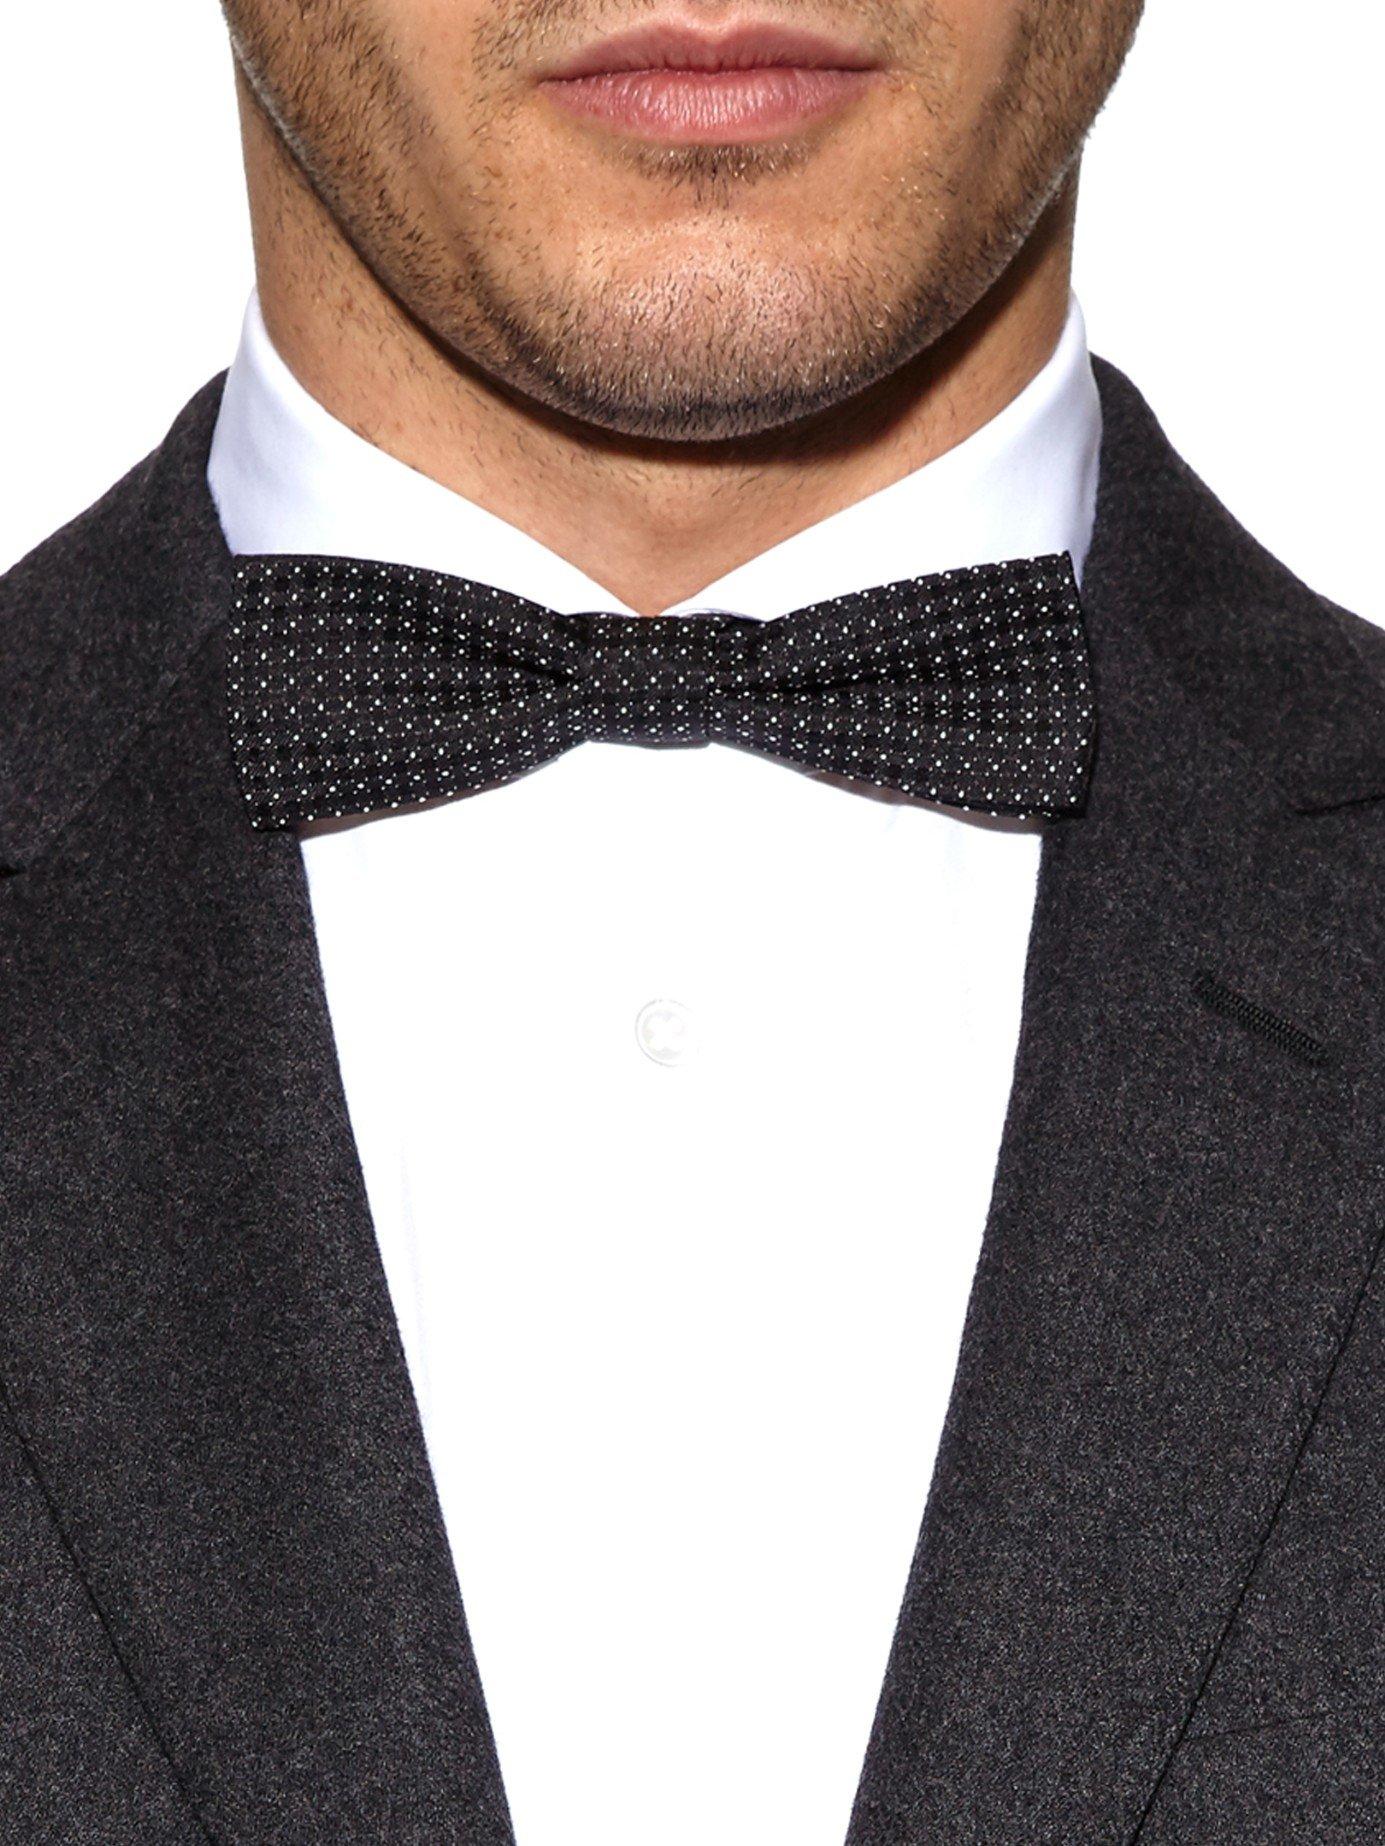 d0c71c8960dd ... ireland lyst dolce gabbana polka dot jacquard silk bow tie in black for  men 5c109 ea79b ...